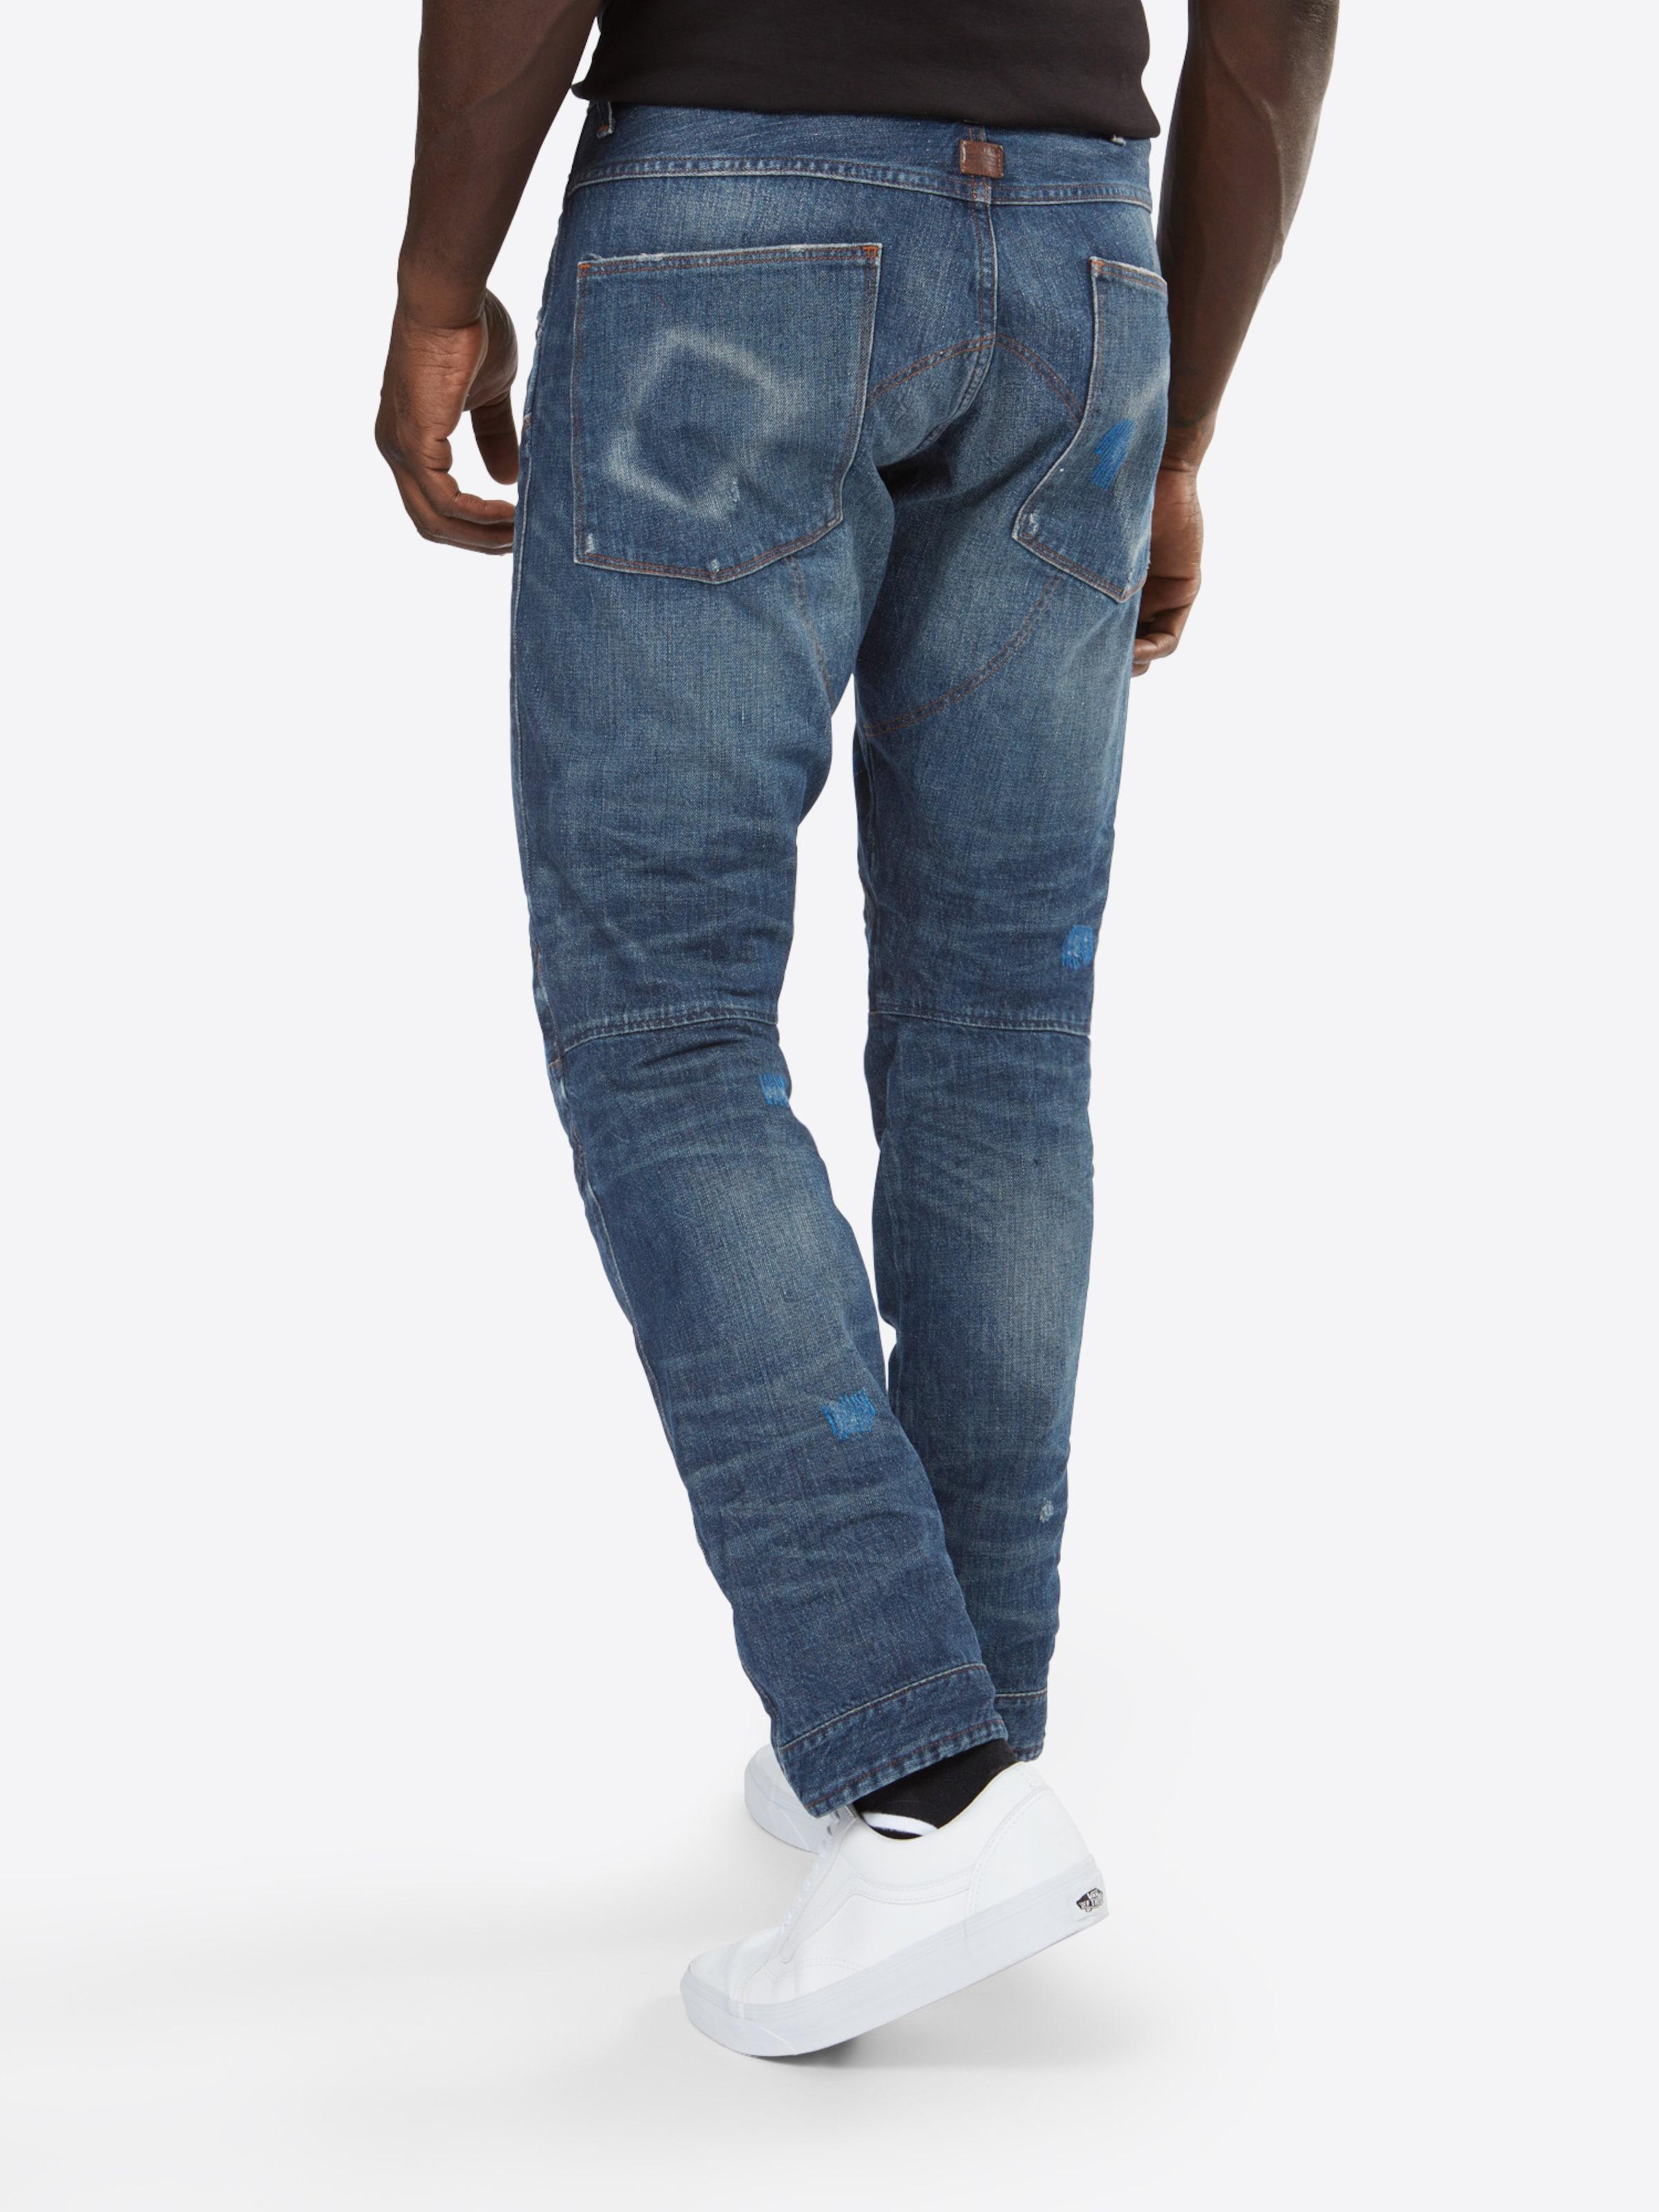 Insbesondere Rabatt G-STAR RAW Jeans '5620 3D Tapered' Schlussverkauf Verkauf Outlet-Store HhNMIr4